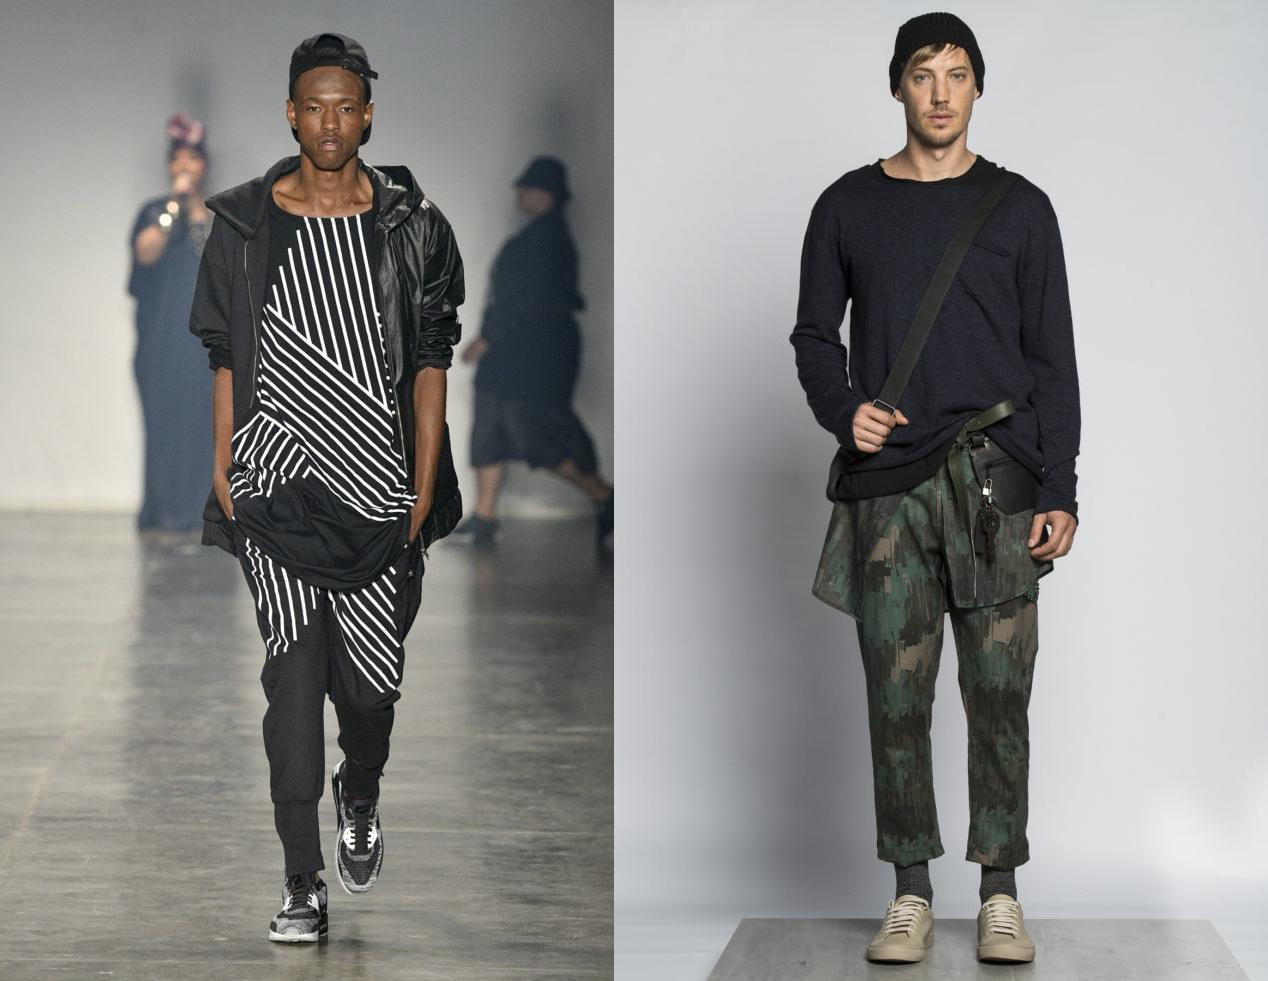 calça masculina, jogger masculina, capri masculina, legging masculina, destroyed masculino, blog de moda masculina, alex cursino, moda sem censura, dicas de moda, spfw n43